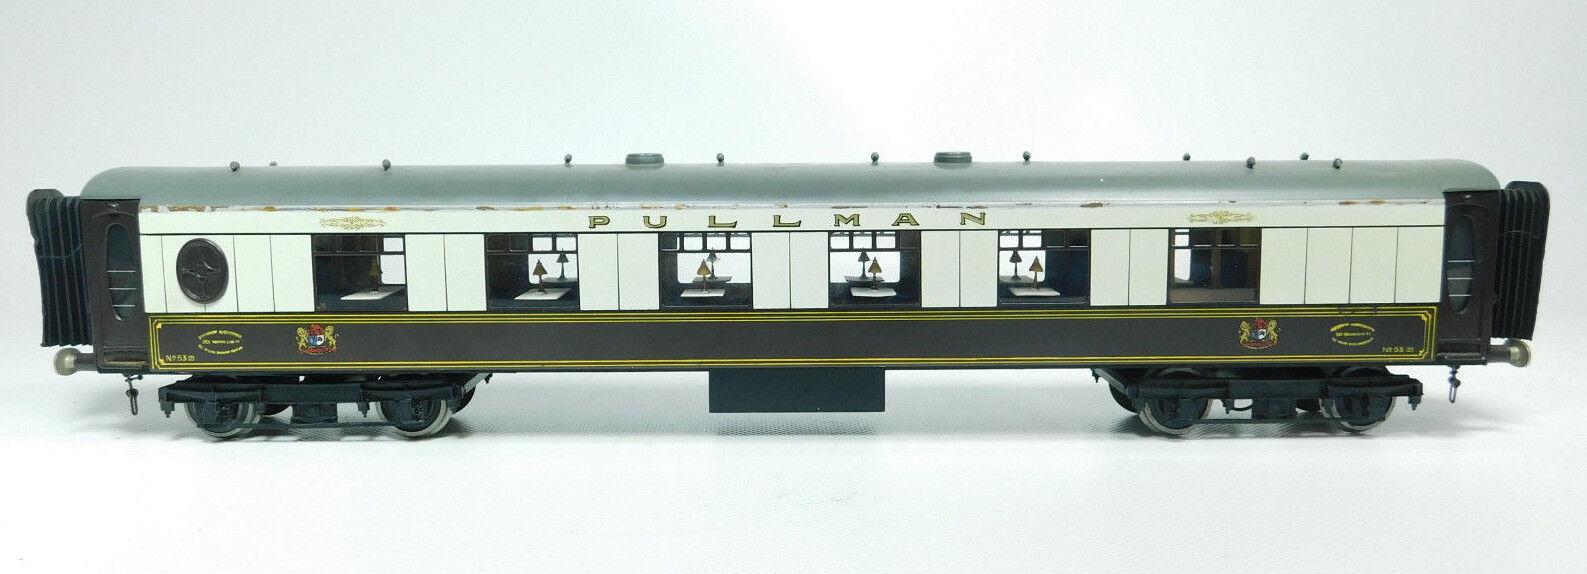 Bi666-2  FULGUREX traccia lamiera 0 dc - vetture passeggeri pullman no 53 buffer a molla